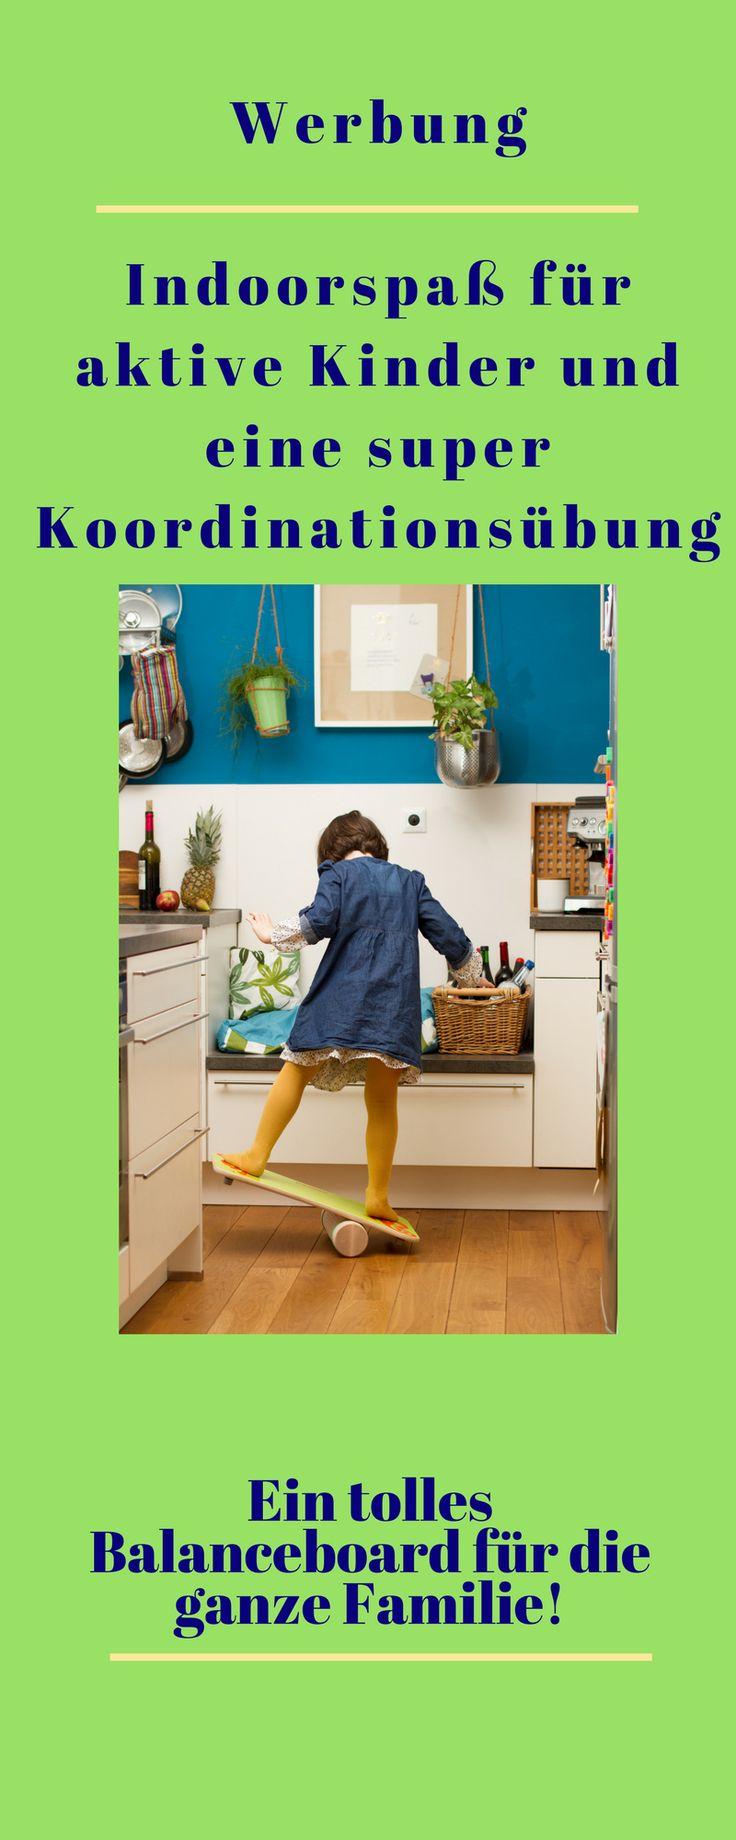 #Werbung #aktivekinder #pedalo #Ostern #koordination #balanceboard